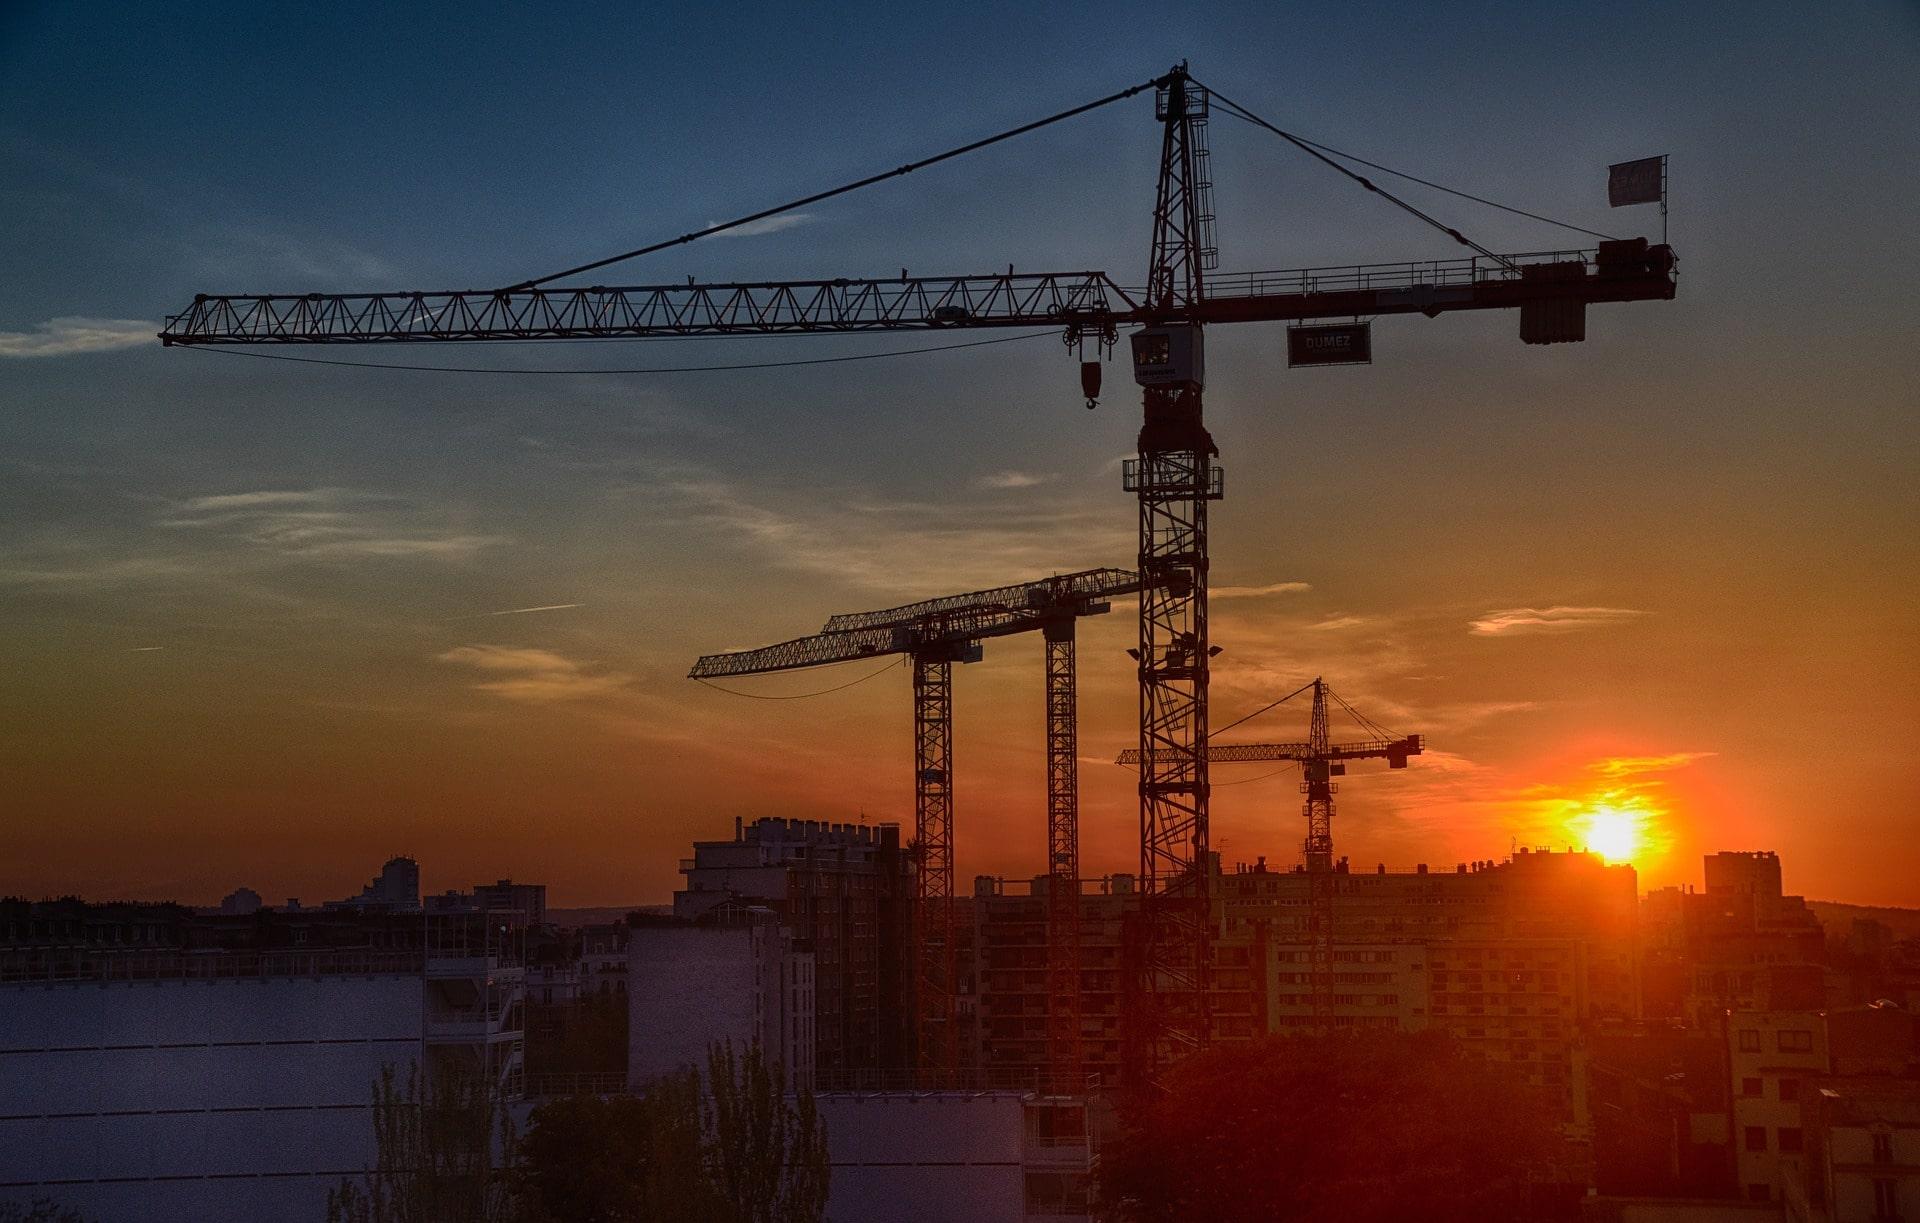 Crane at sunset